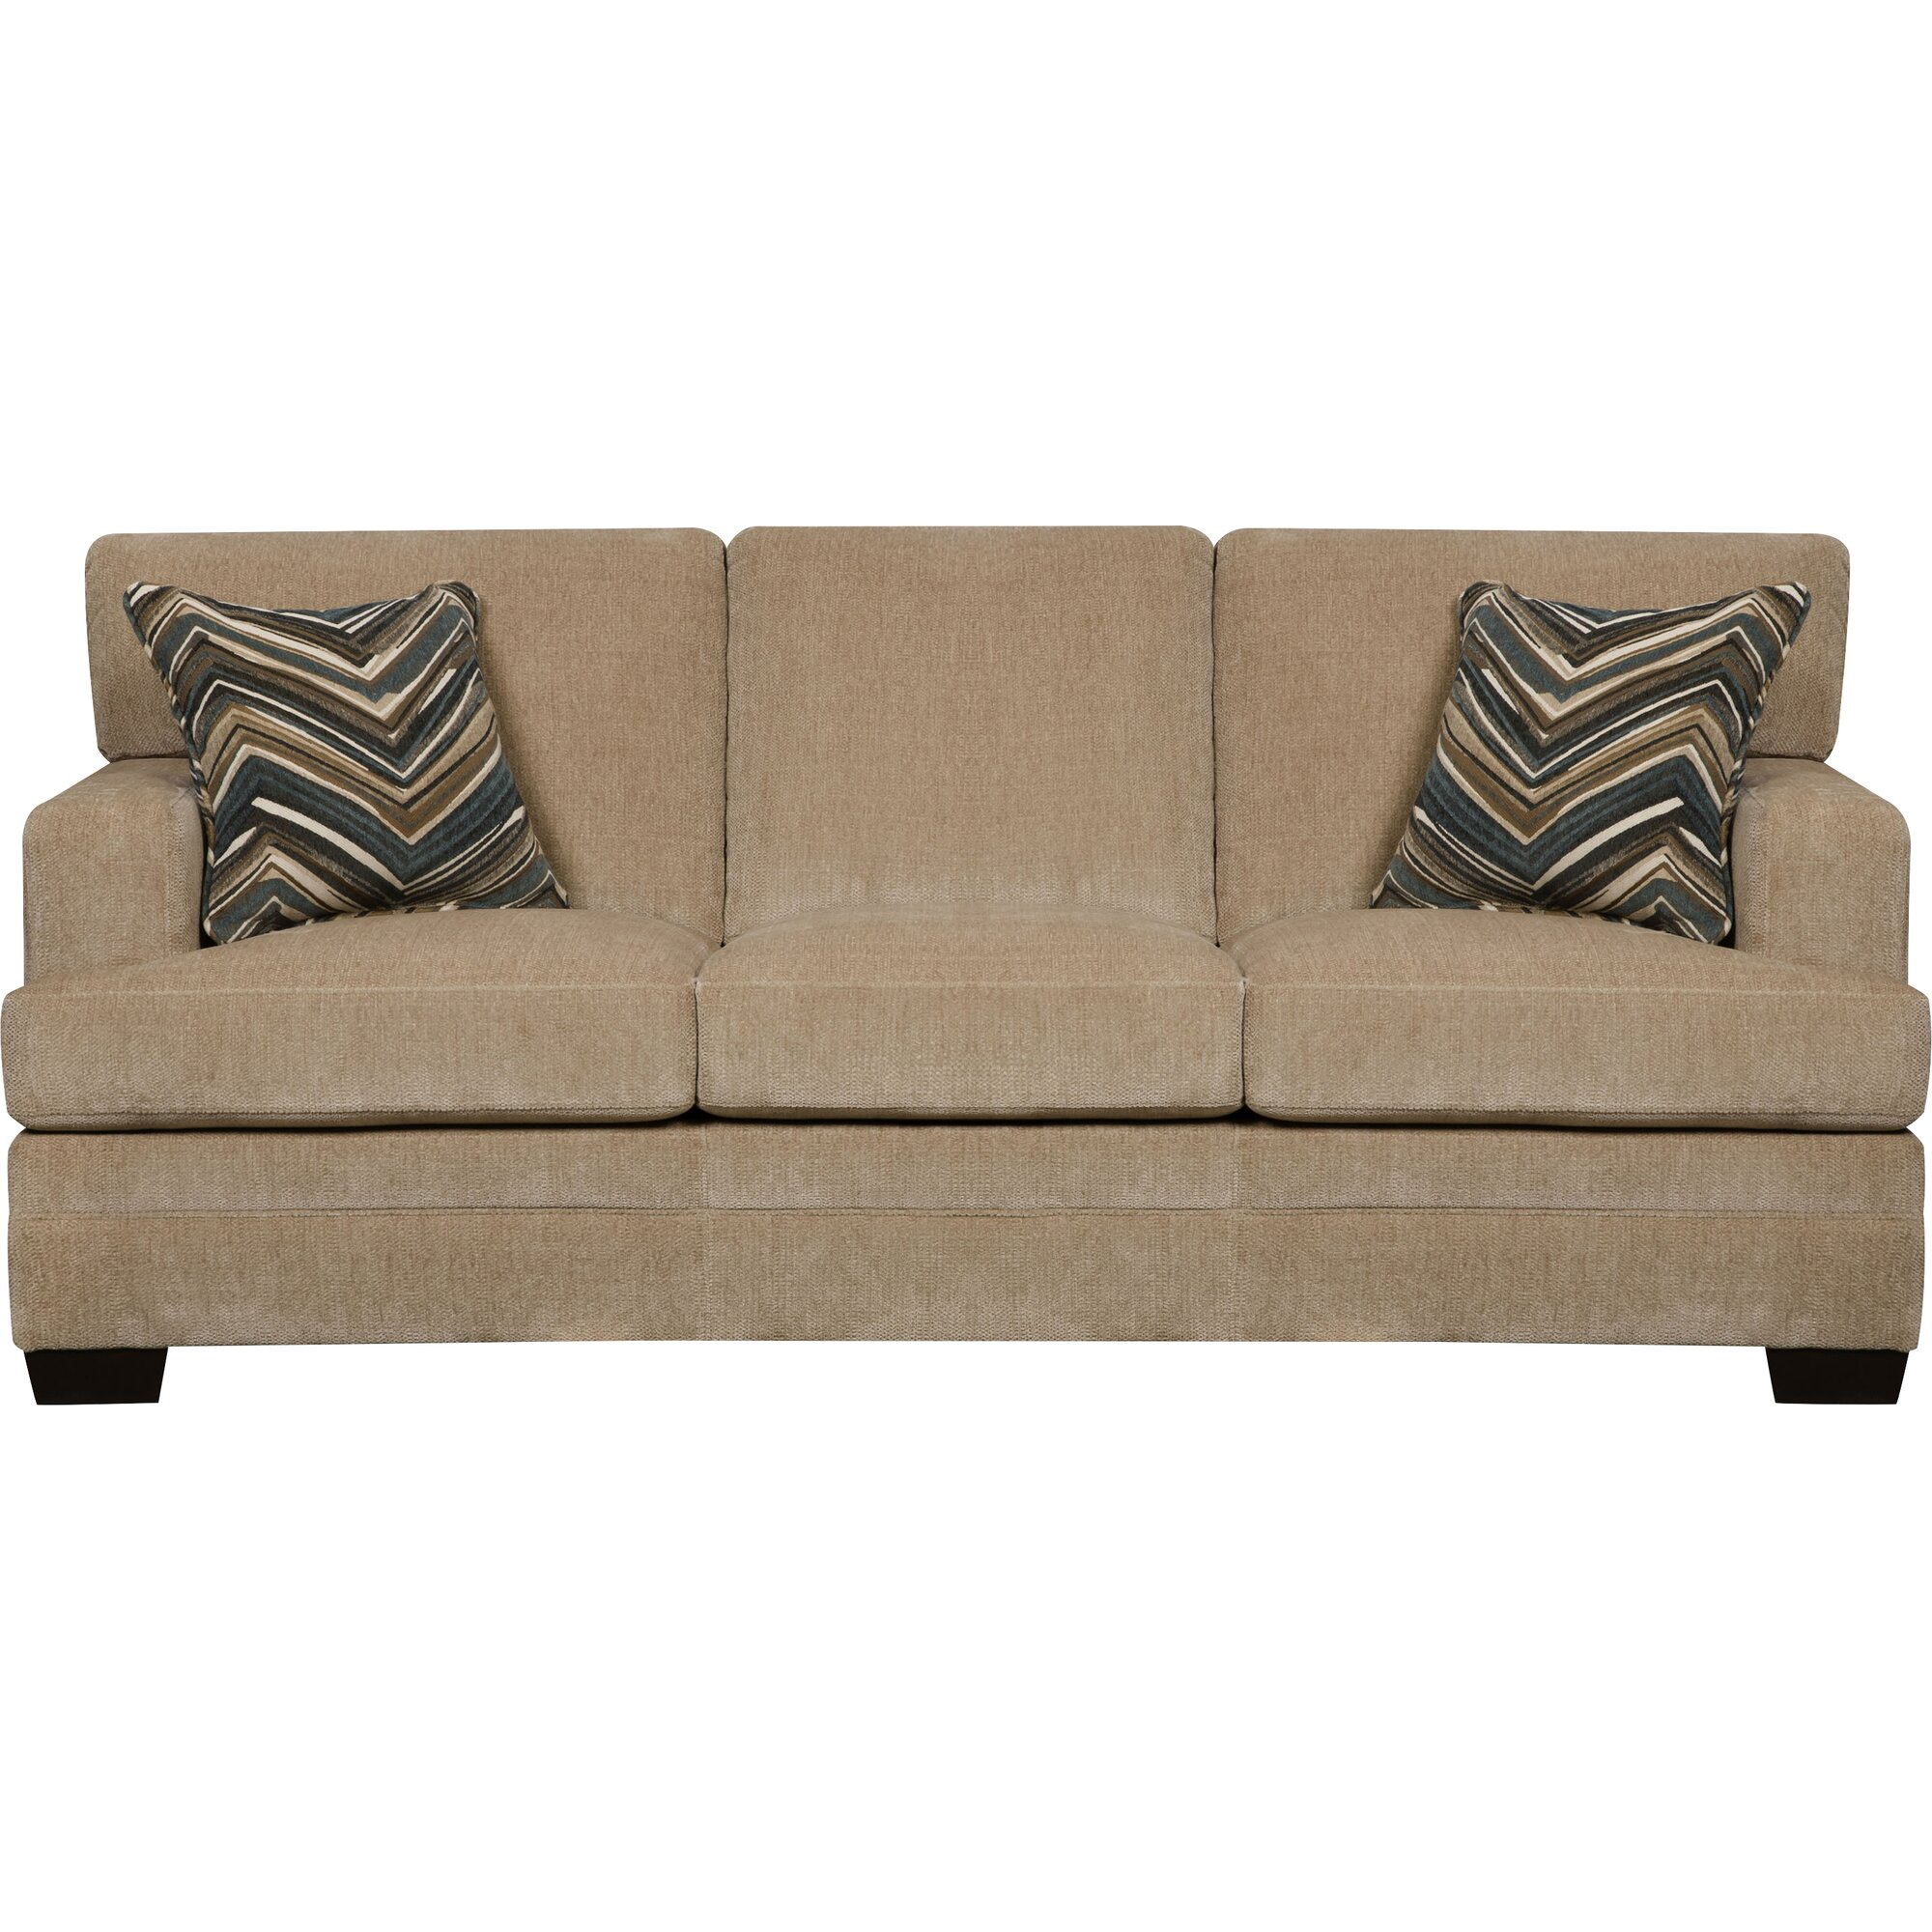 simmons sleeper sofa reviews Sofa Hpricot